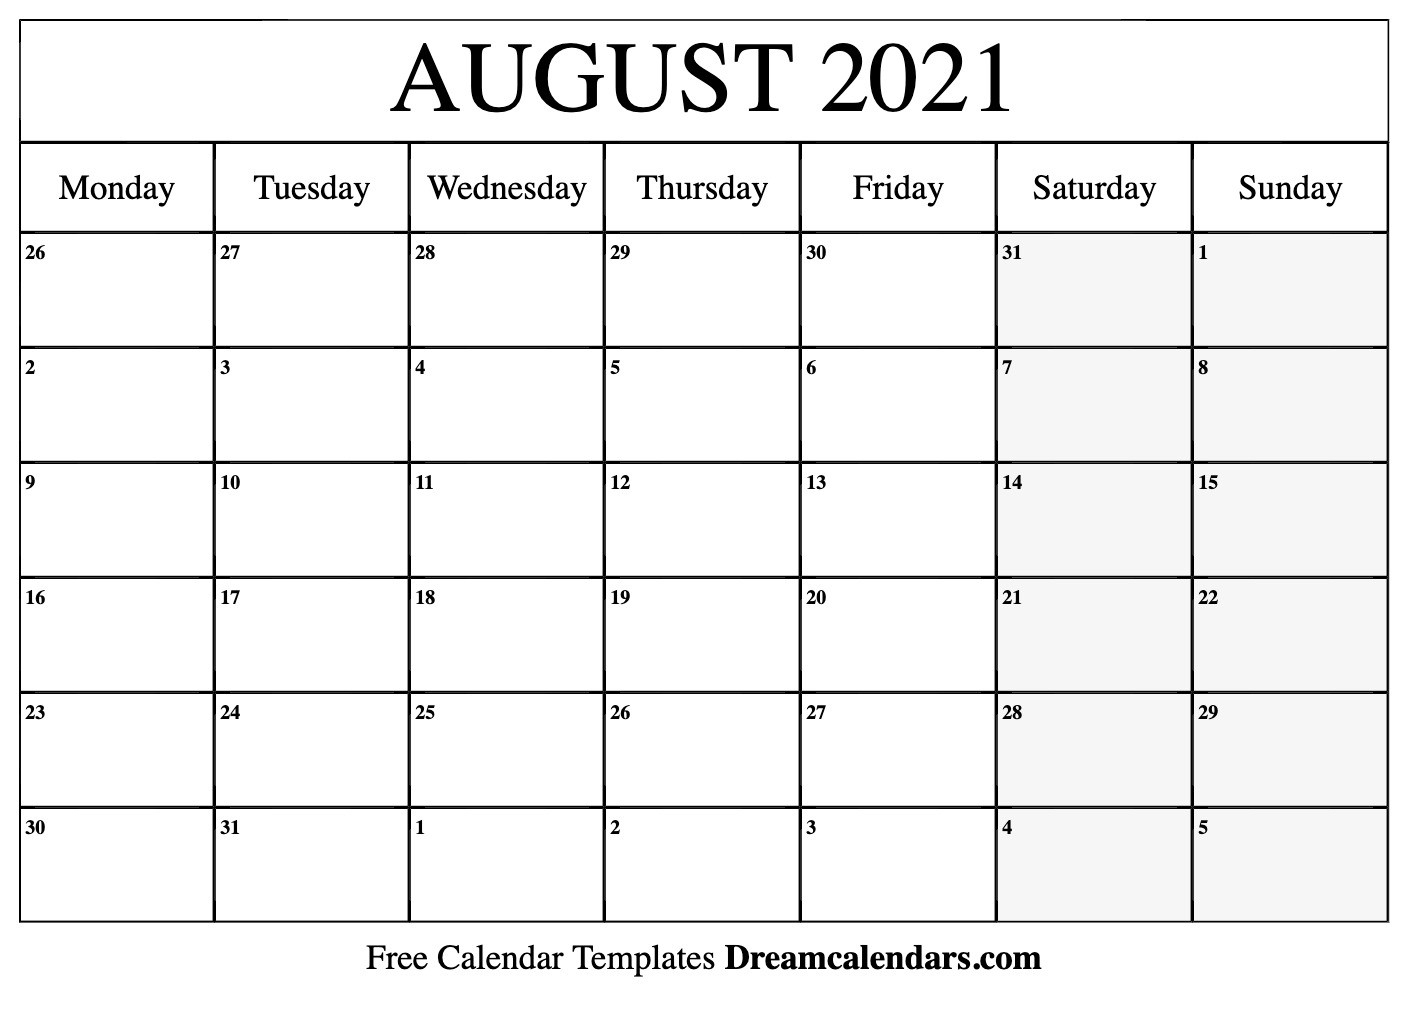 August 2021 Calendar | Free Blank Printable Templates  Summer Months 2021 Calendar